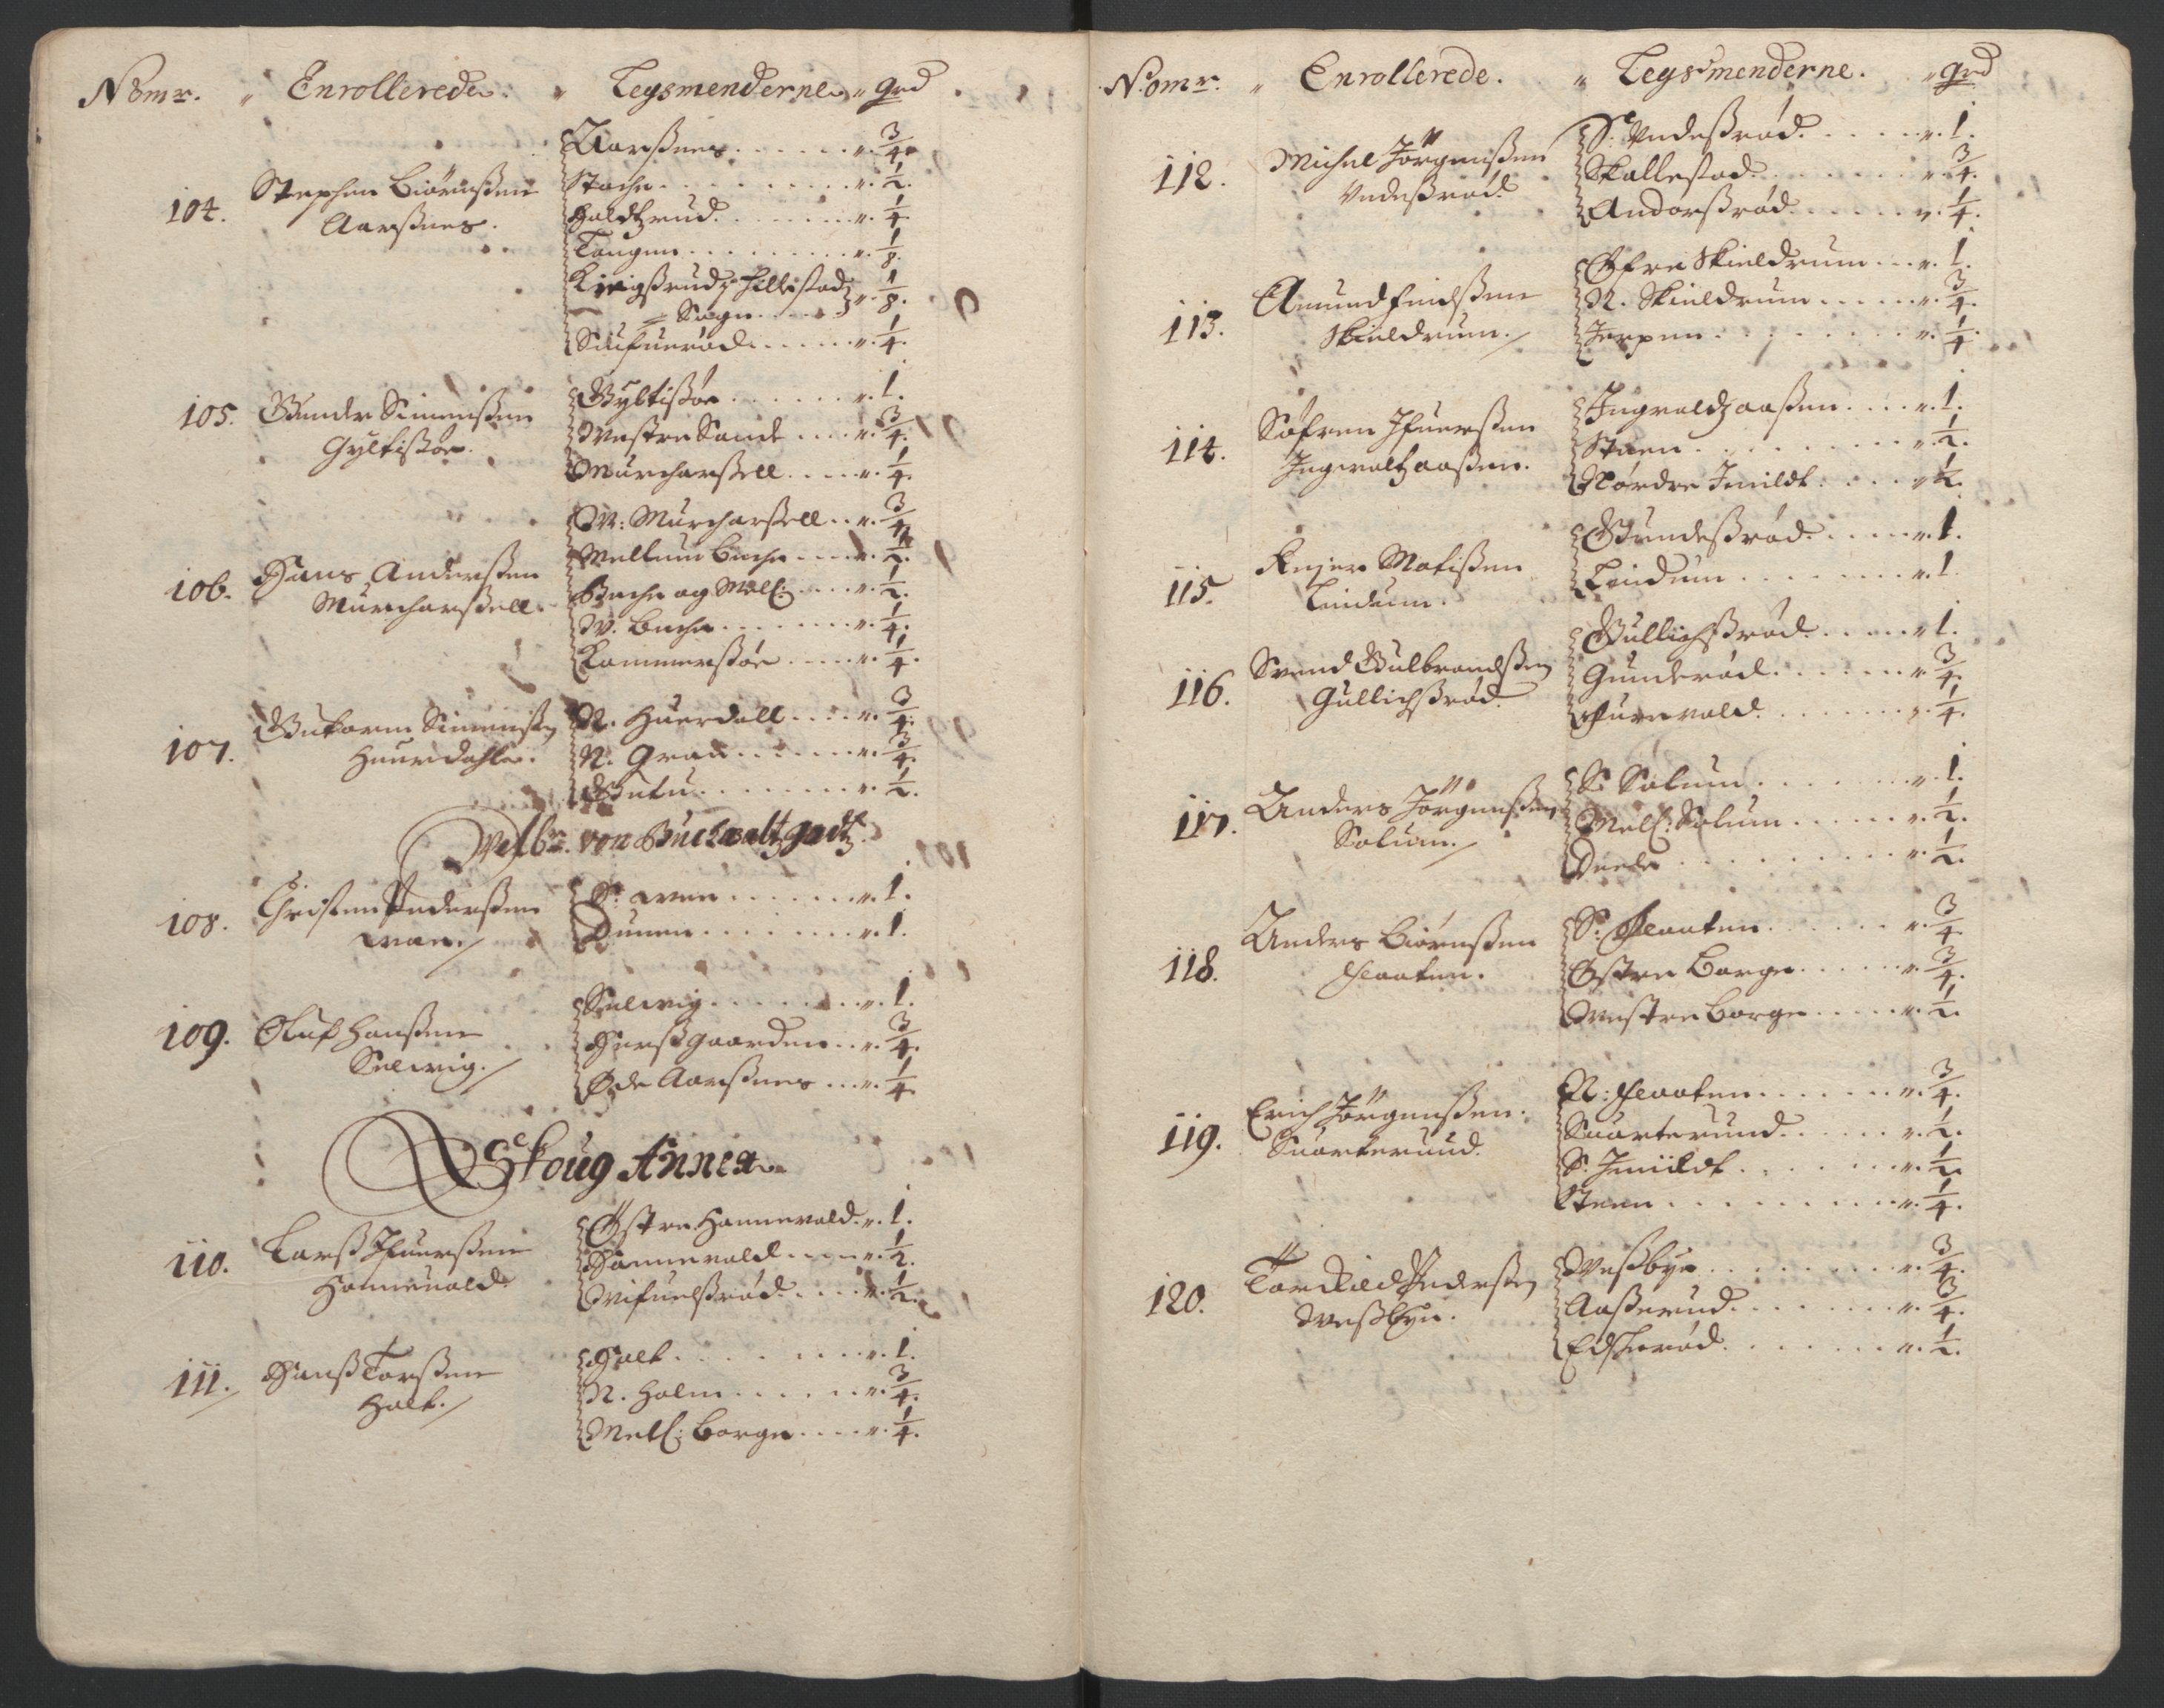 RA, Rentekammeret inntil 1814, Reviderte regnskaper, Fogderegnskap, R32/L1865: Fogderegnskap Jarlsberg grevskap, 1692, s. 214